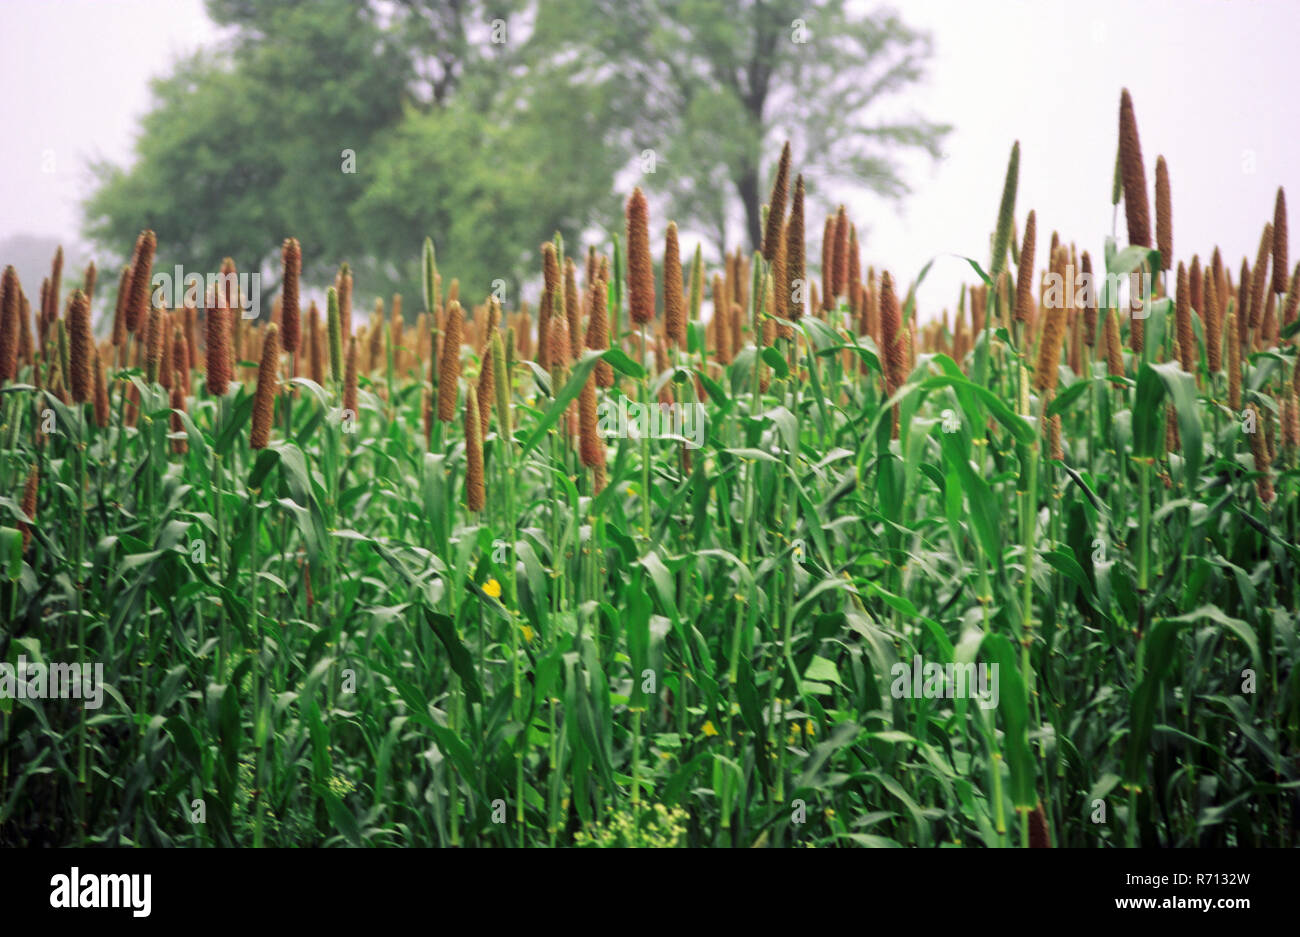 bajra (cereal-grain) fields, sakuri, maharashtra, india - Stock Image